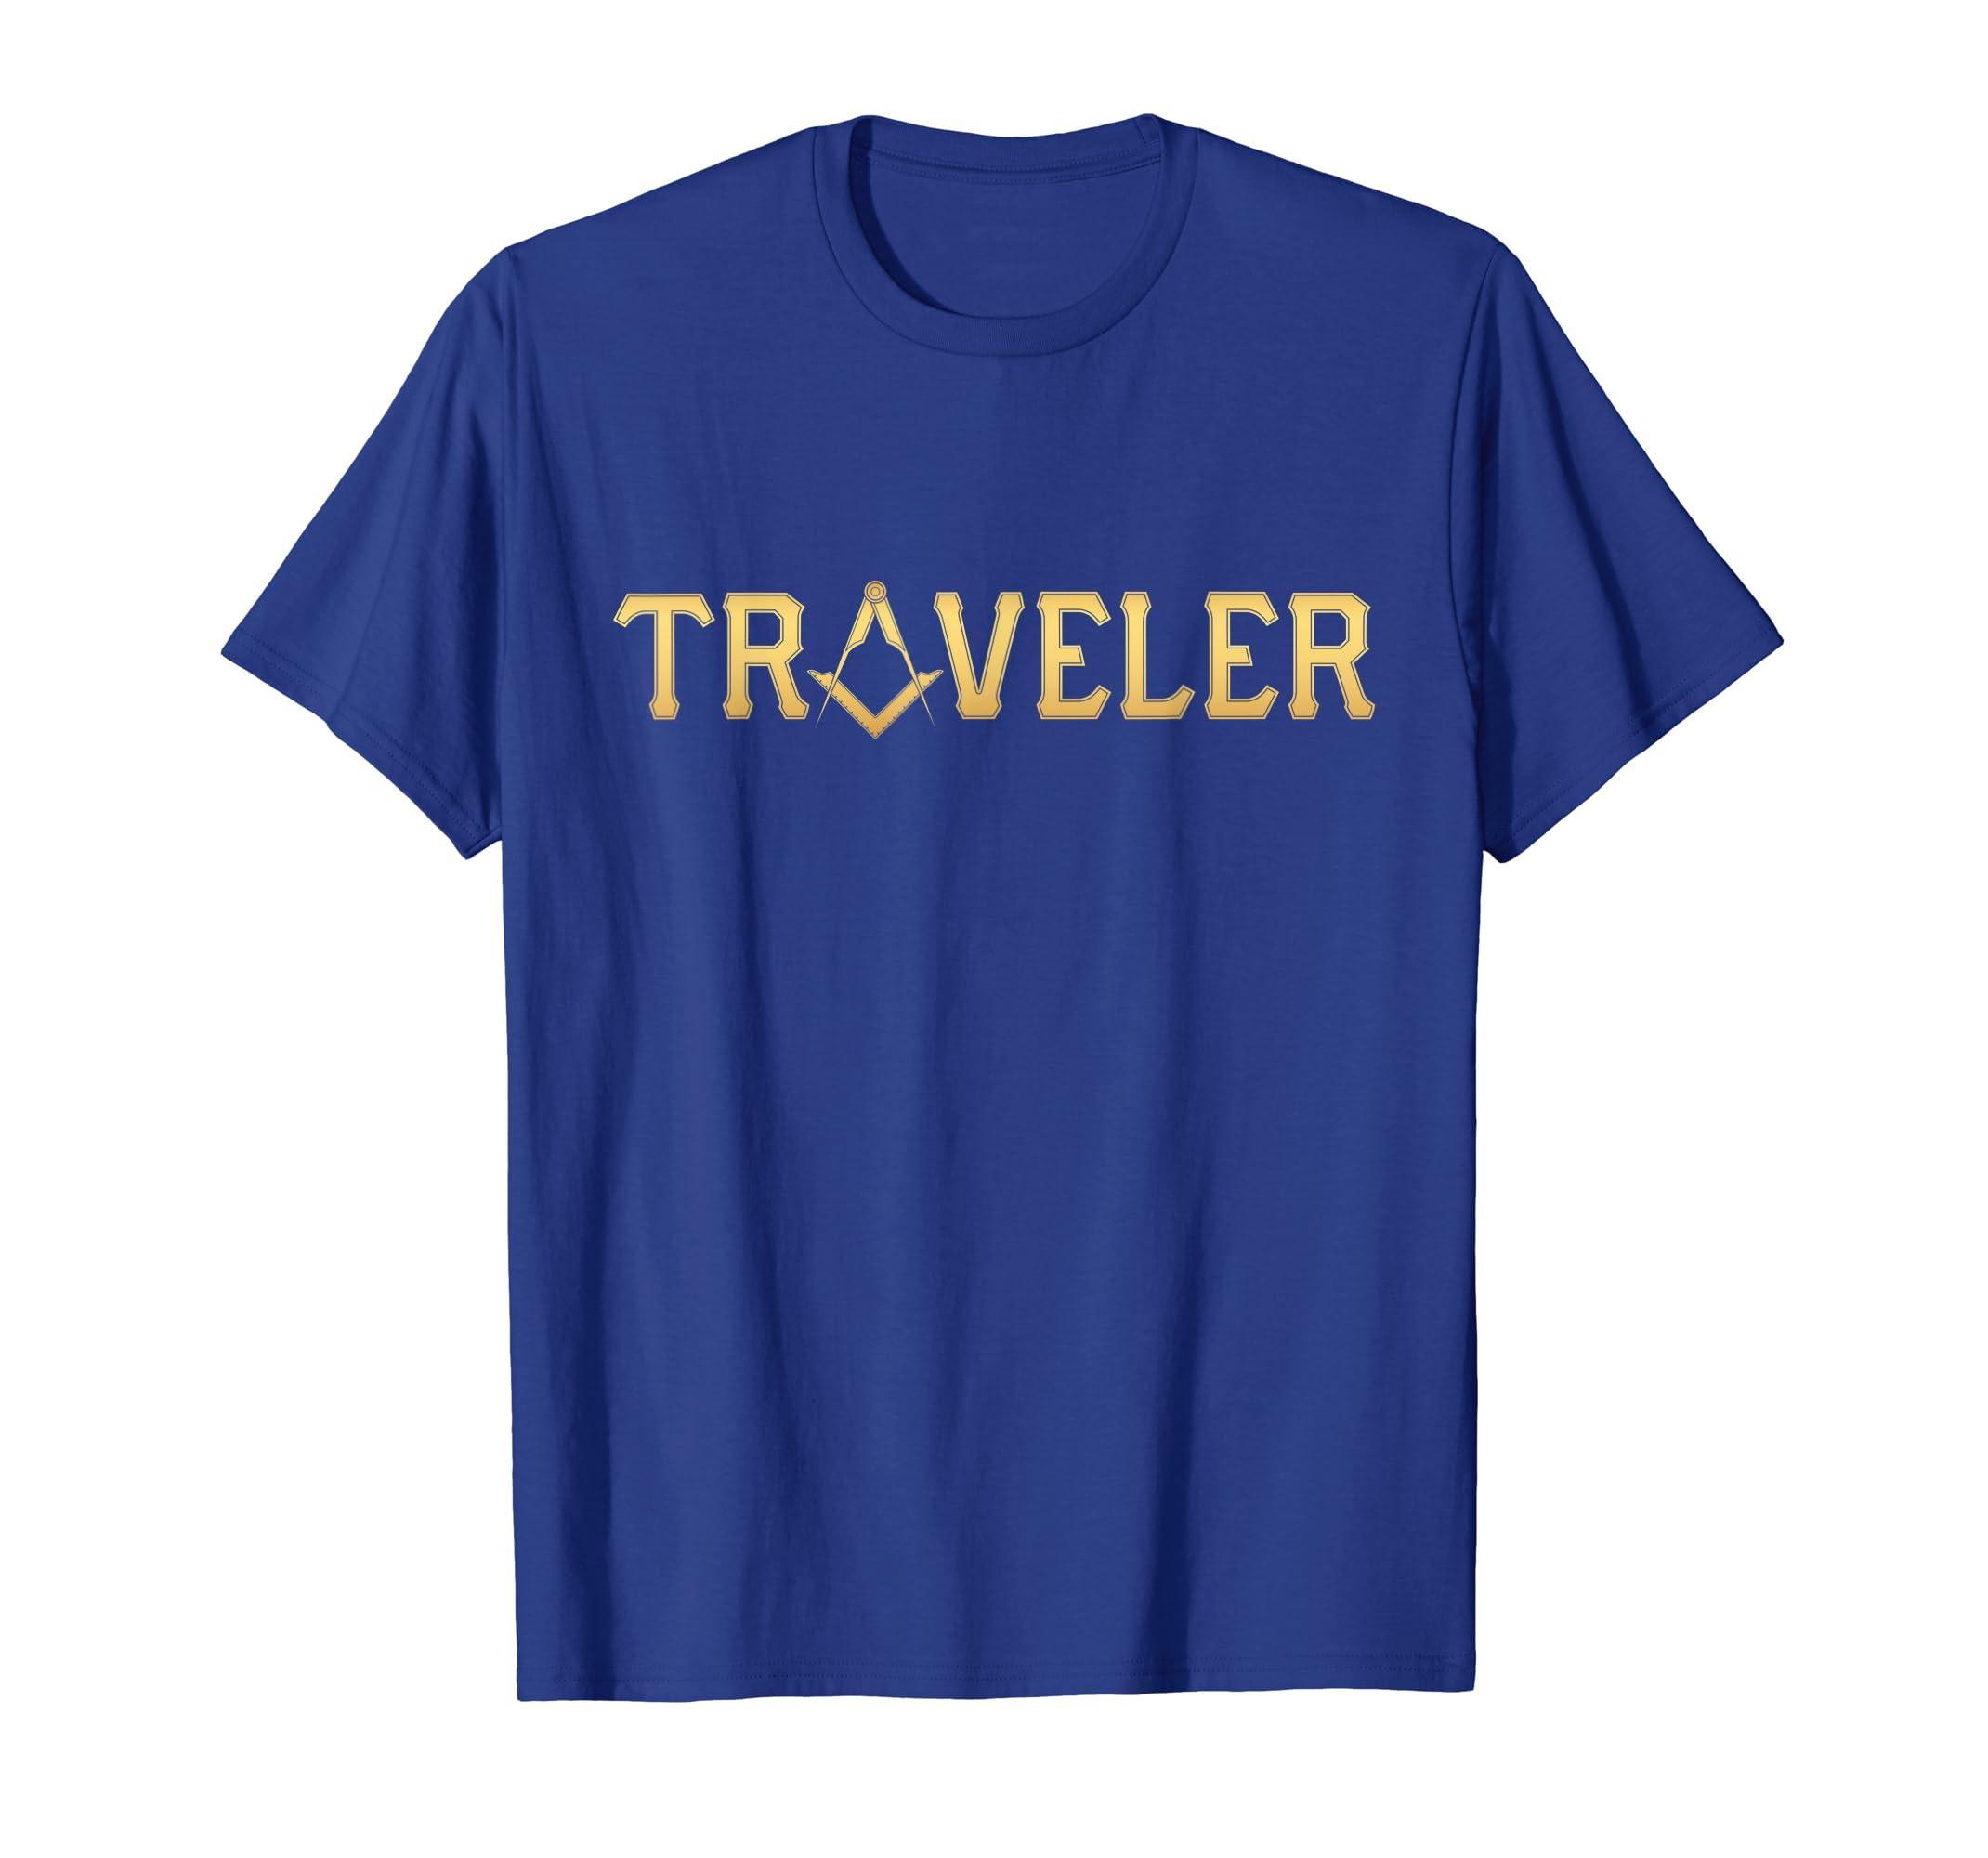 d43f2a31 Amazon.com: Mens Masonic Traveler Square and Compass - Freemason T-Shirt:  Clothing